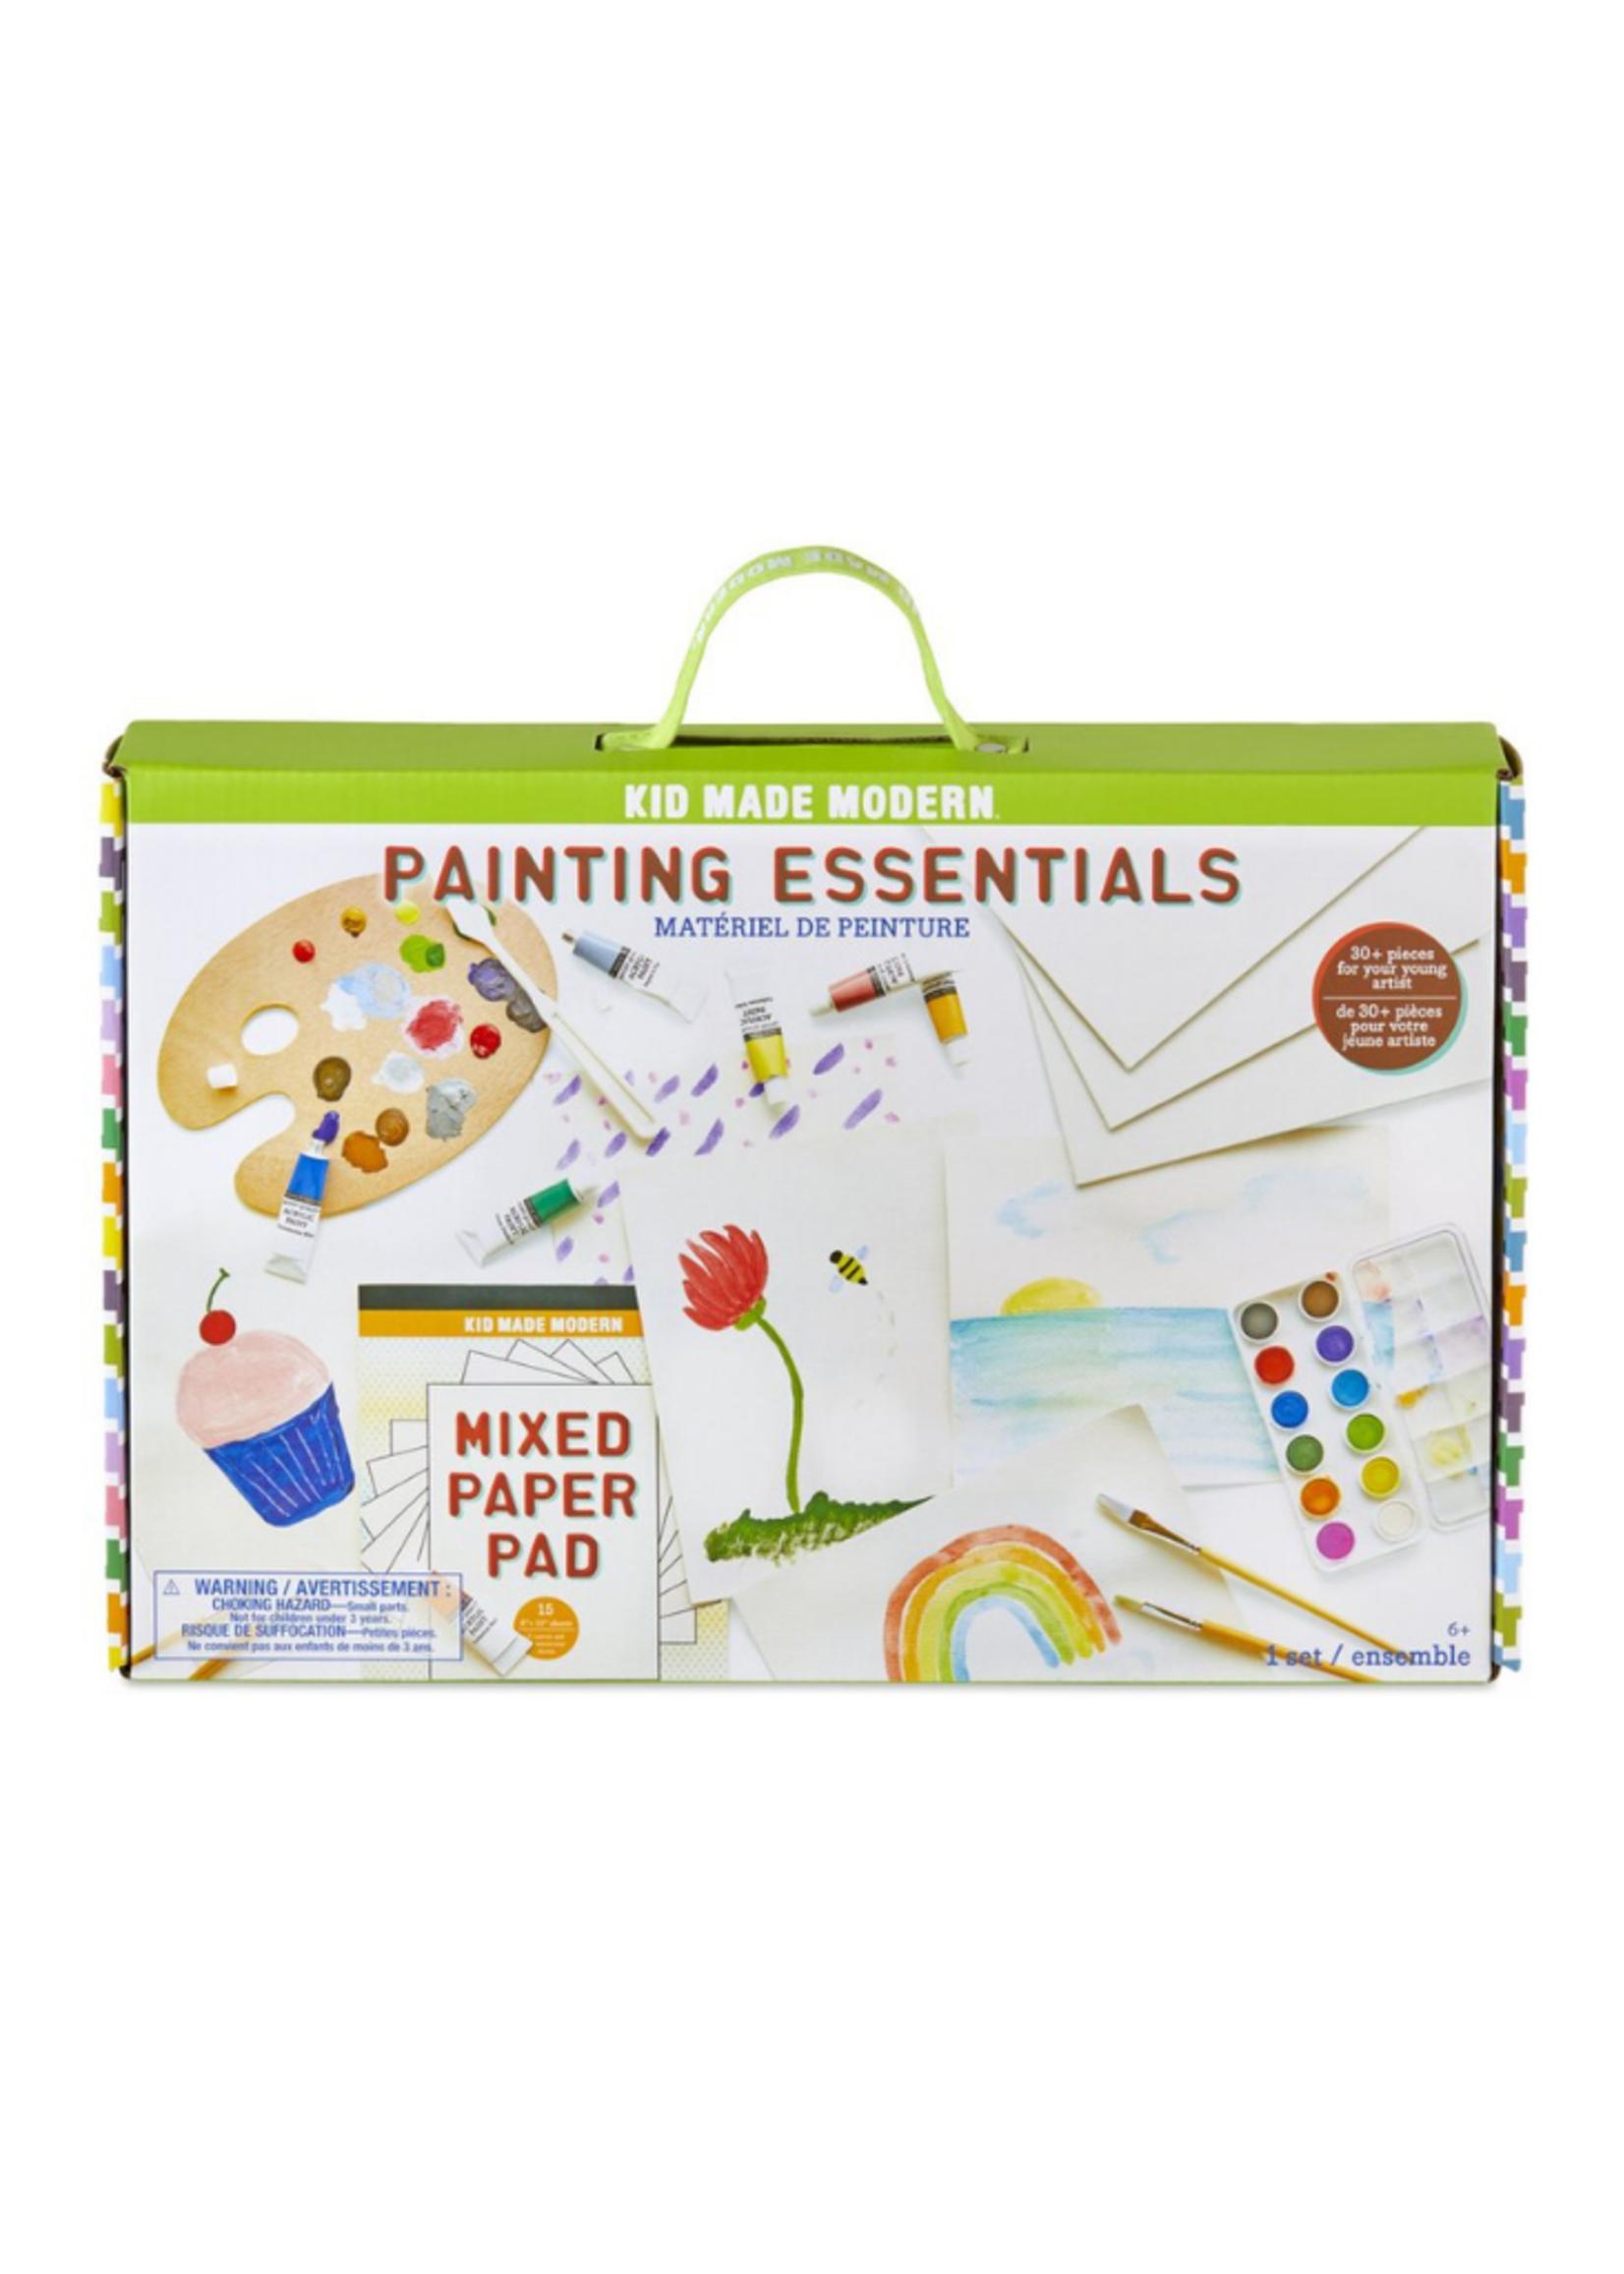 Kids Made Modern Painting Essentials Kit